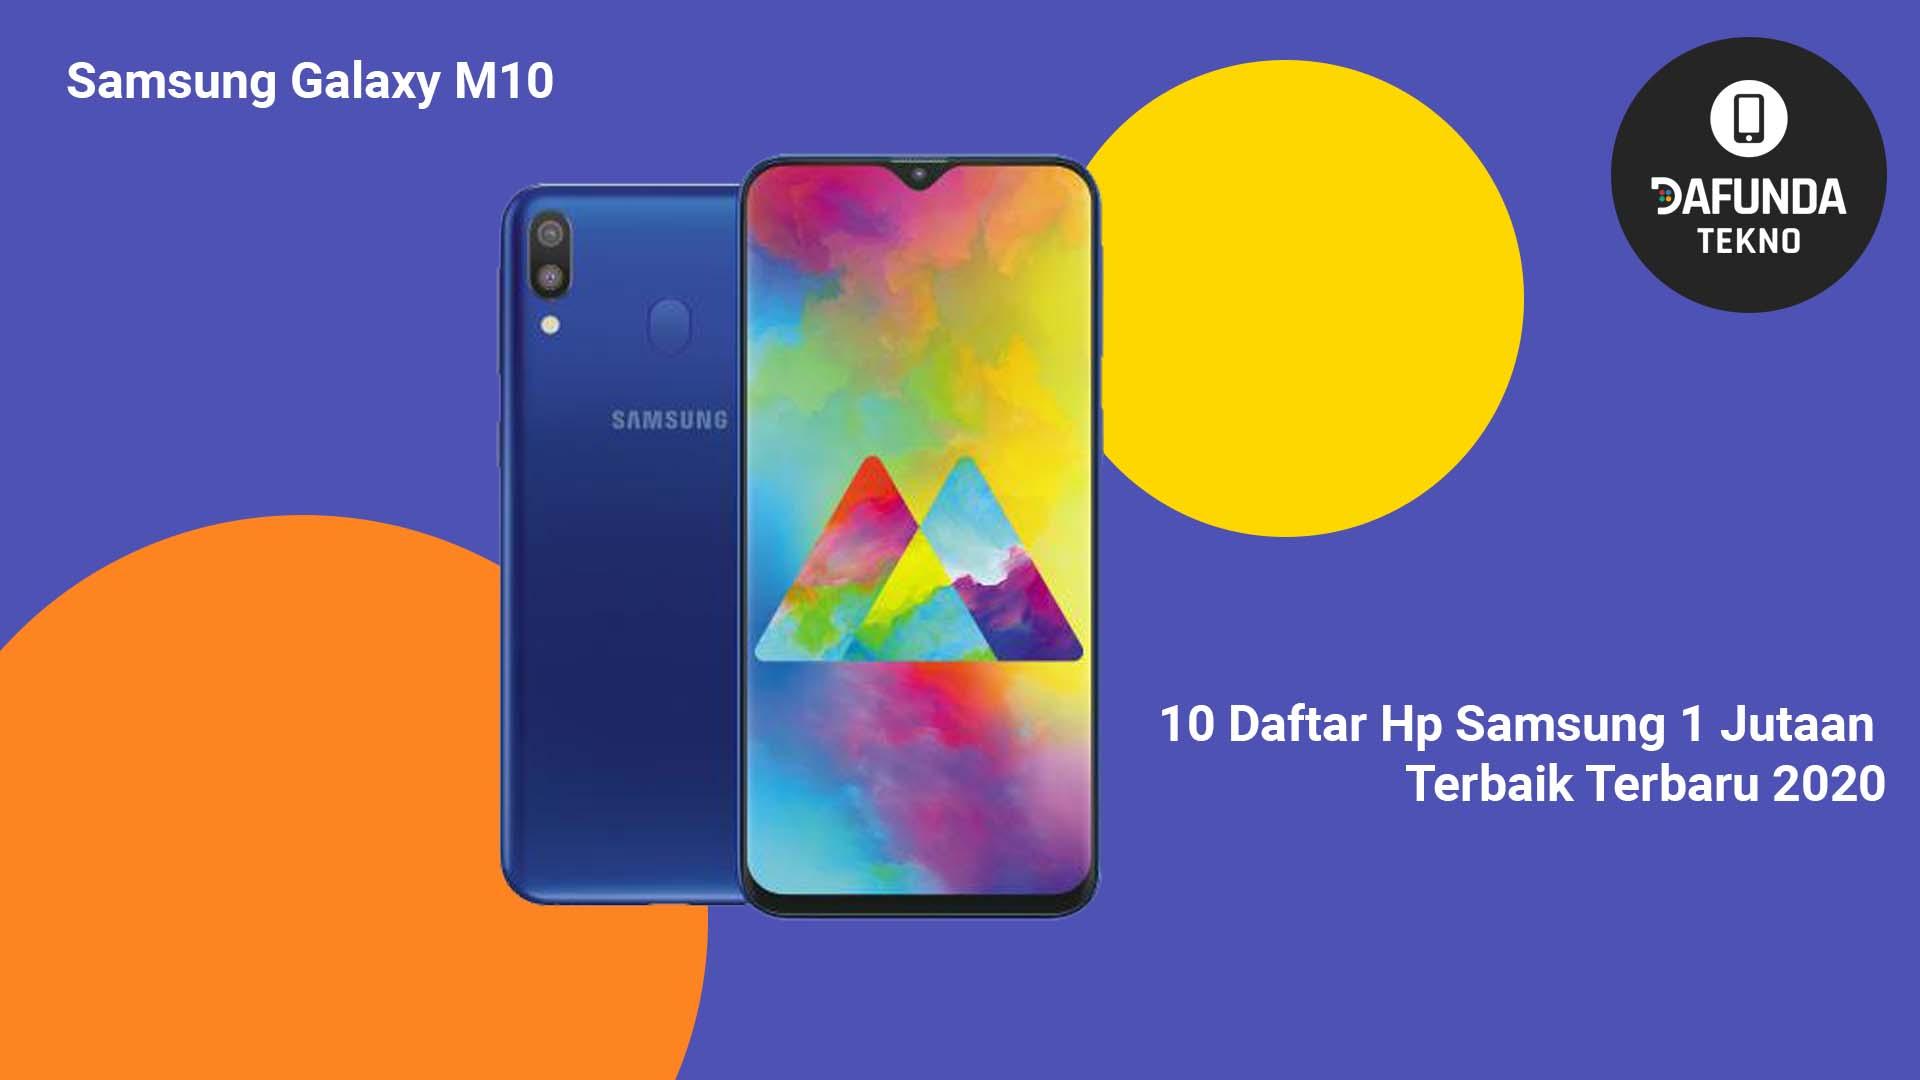 Hp Samsung 1 Jutaan Terbaik Samsung Galaxy M10